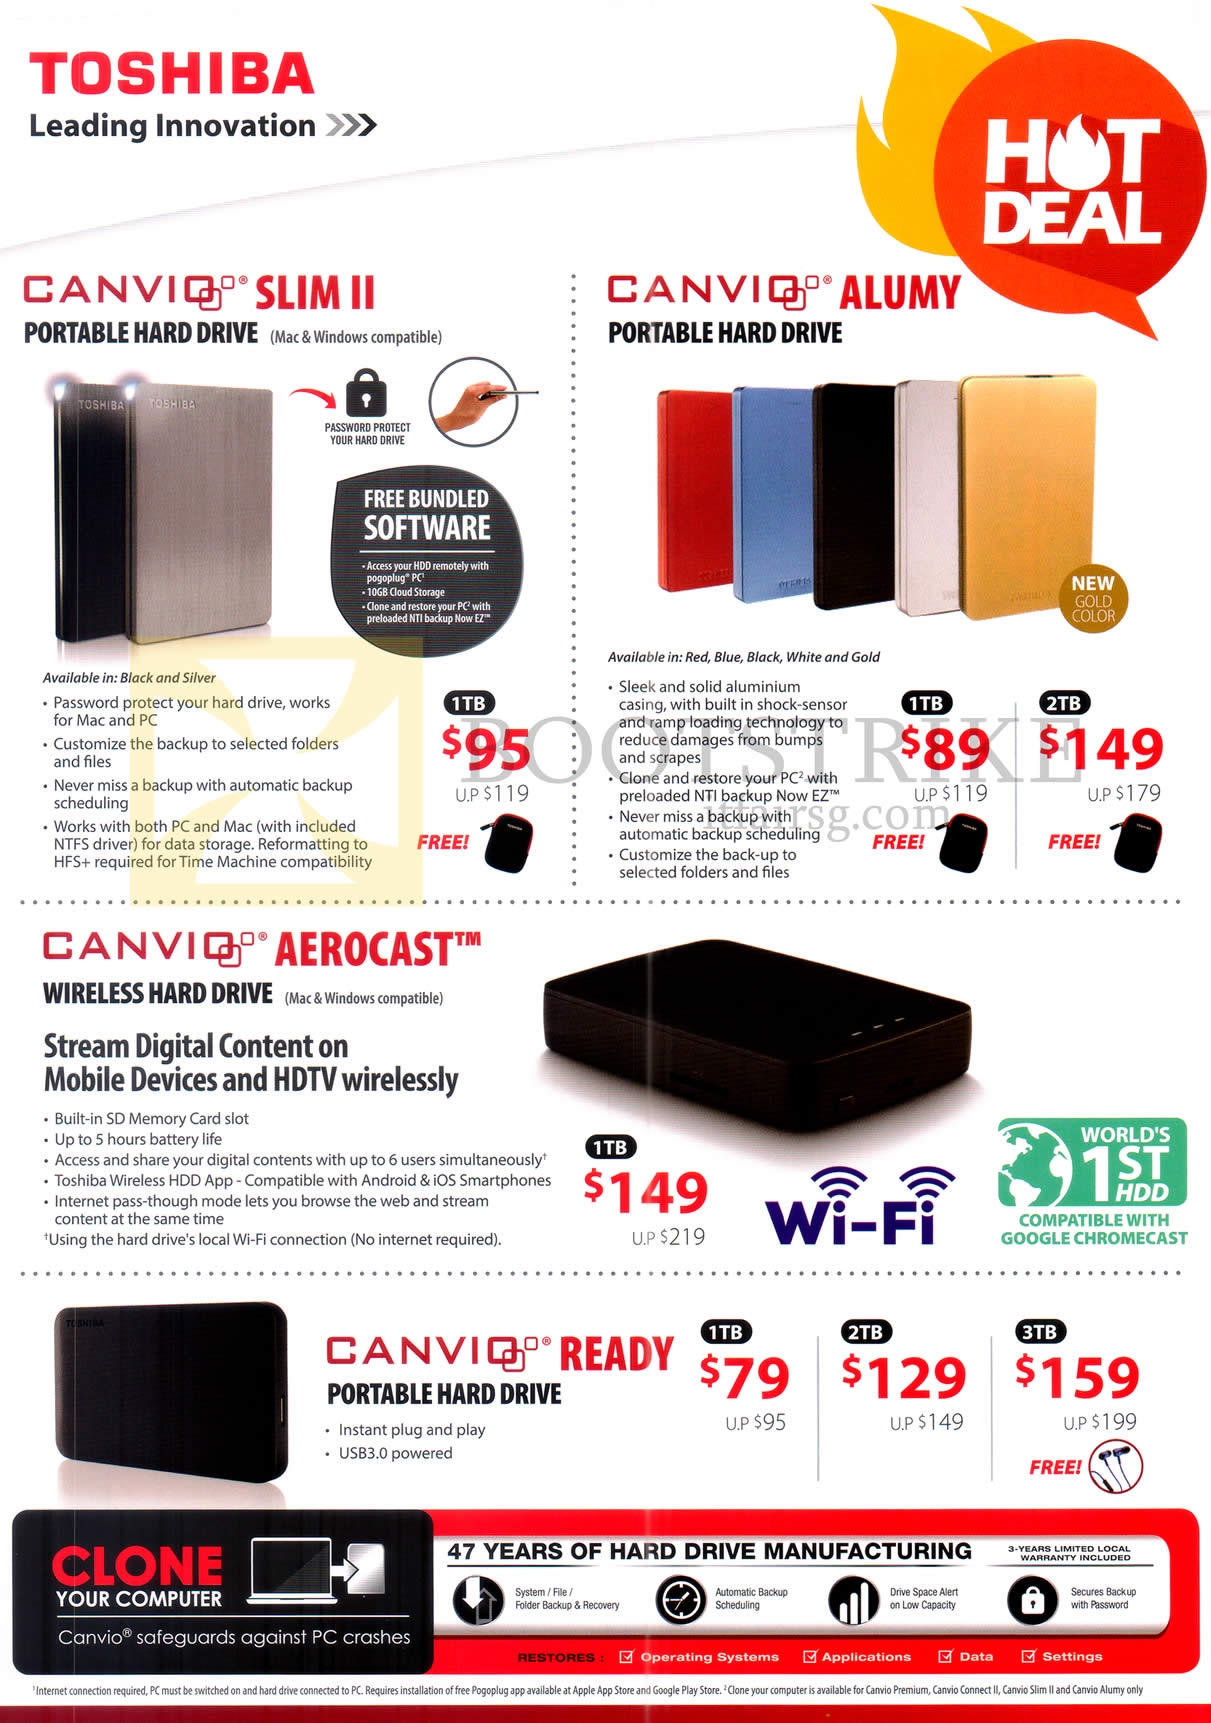 COMEX 2016 price list image brochure of Toshiba External Storage Canvio Slim II, Alumy, Aerocast, Ready, 1TB 2TB 3TB